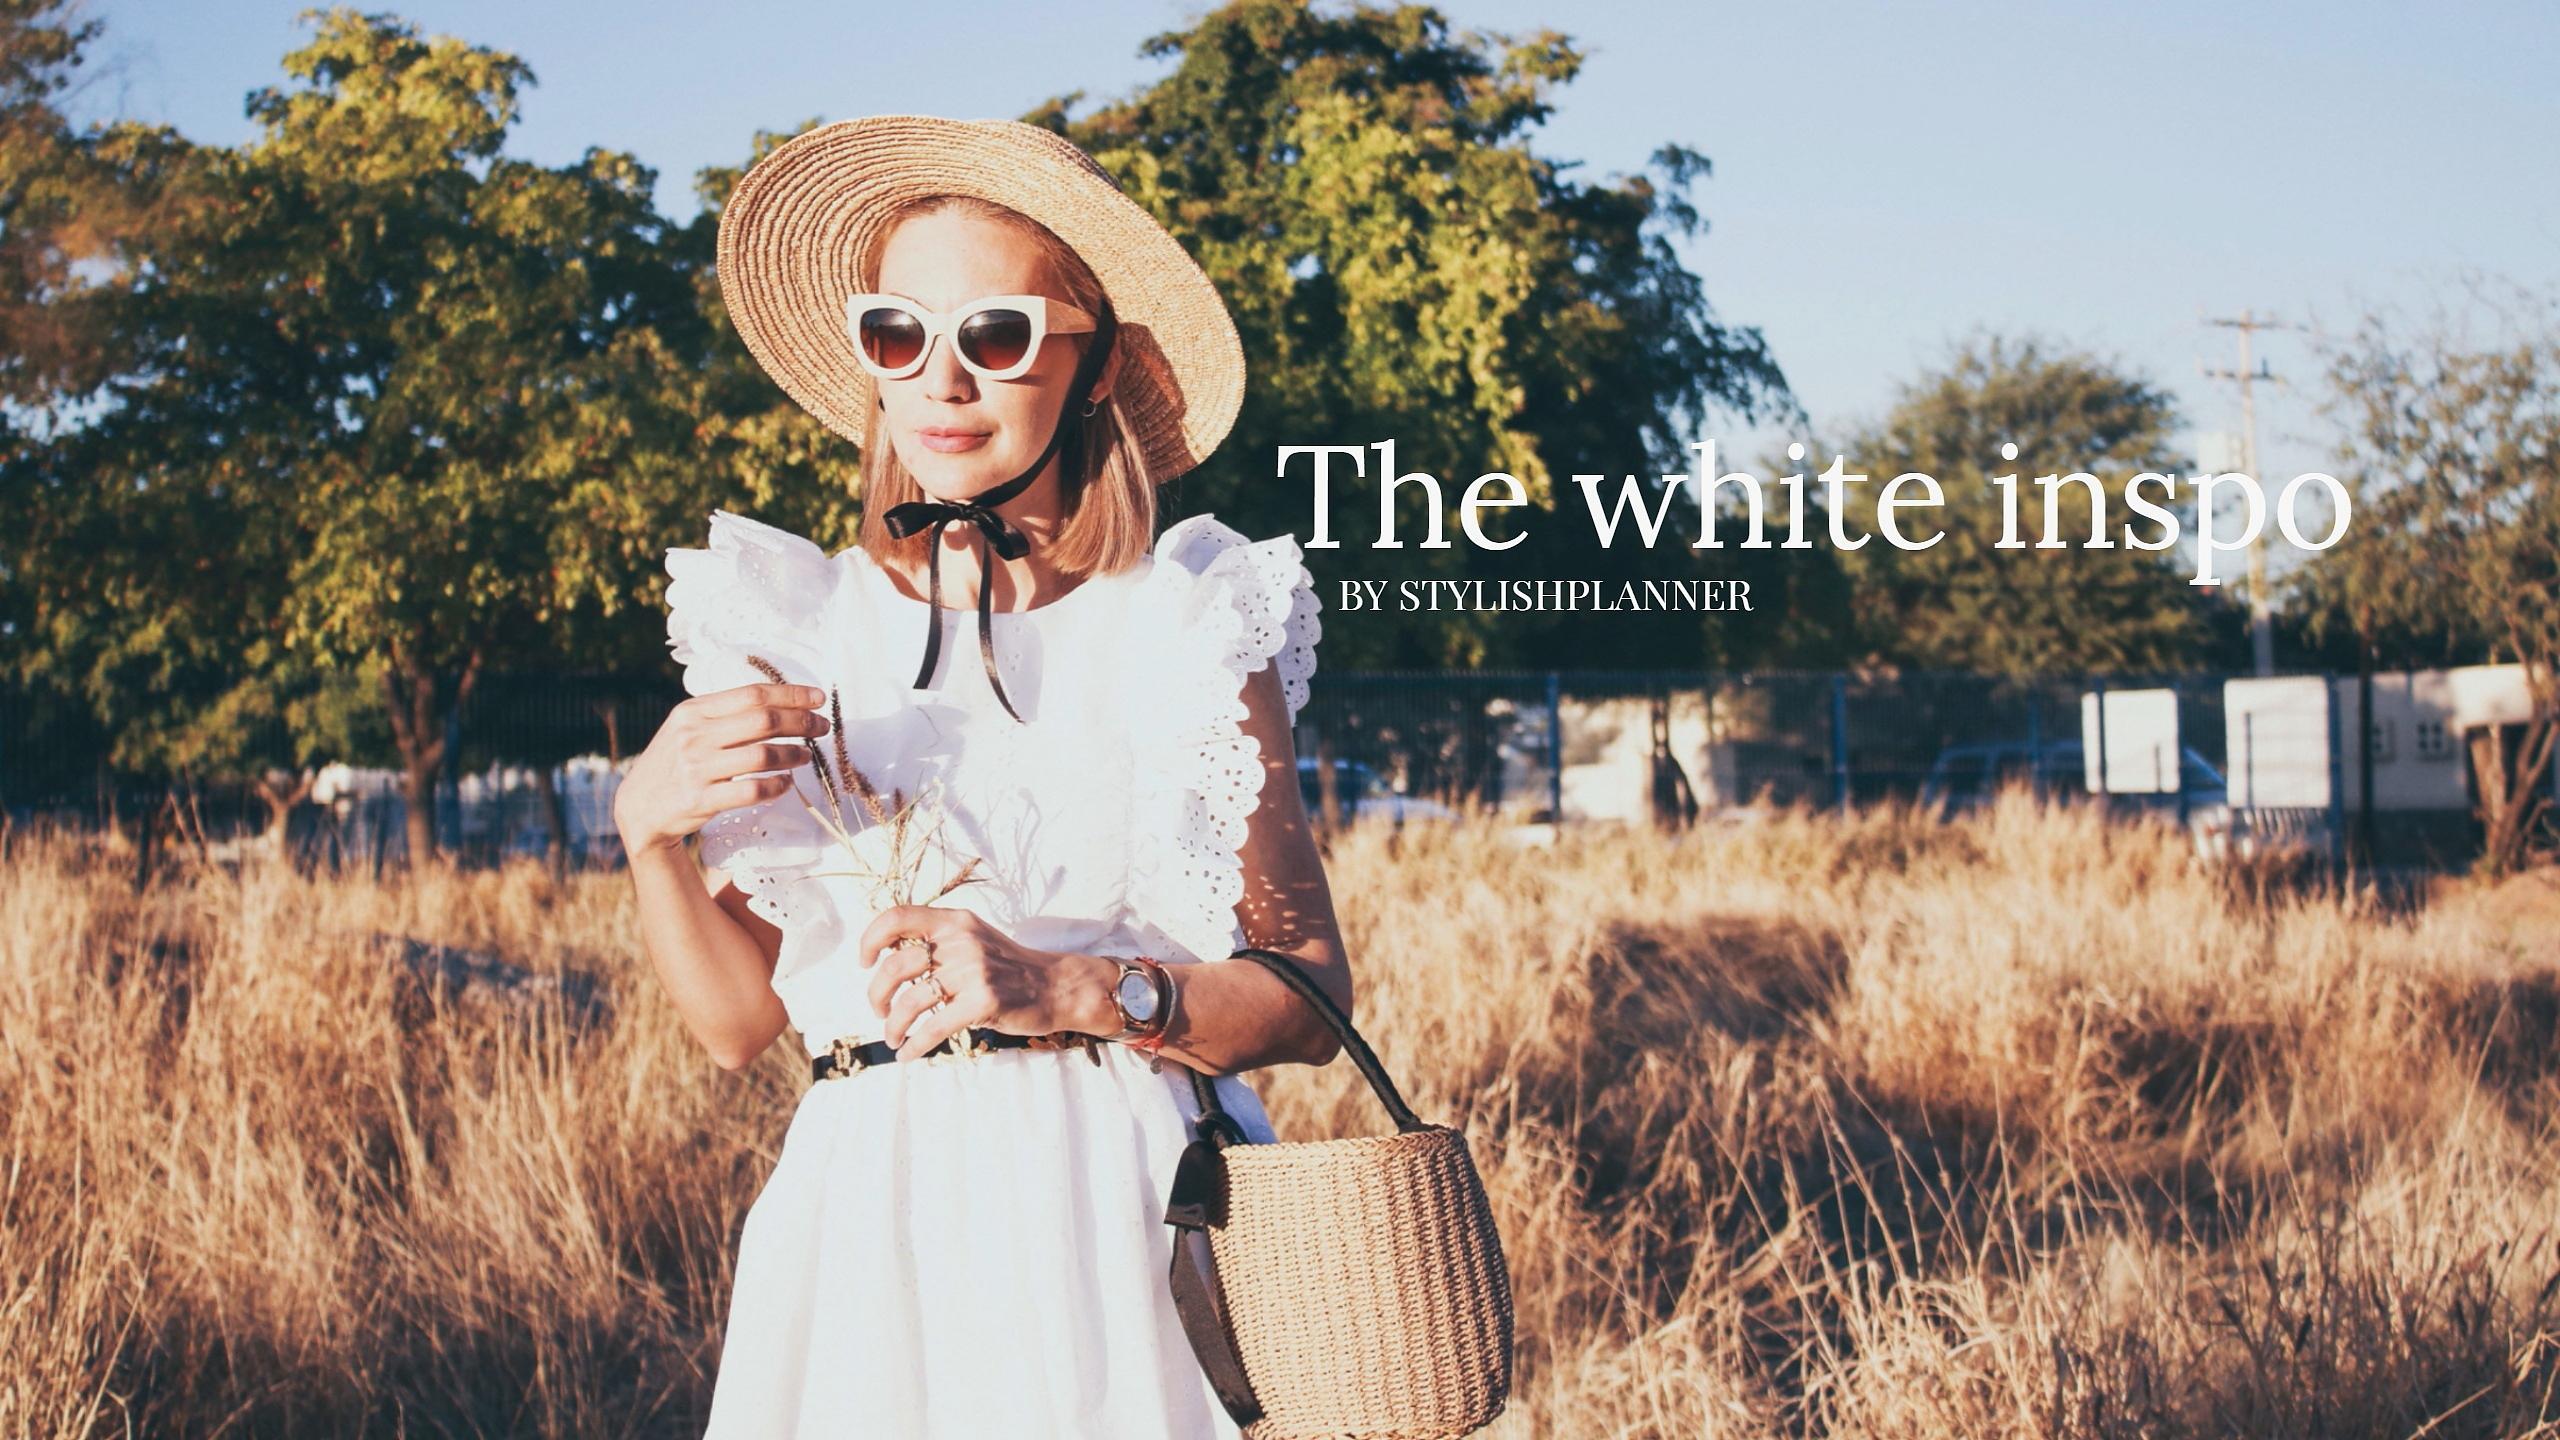 The white inspo